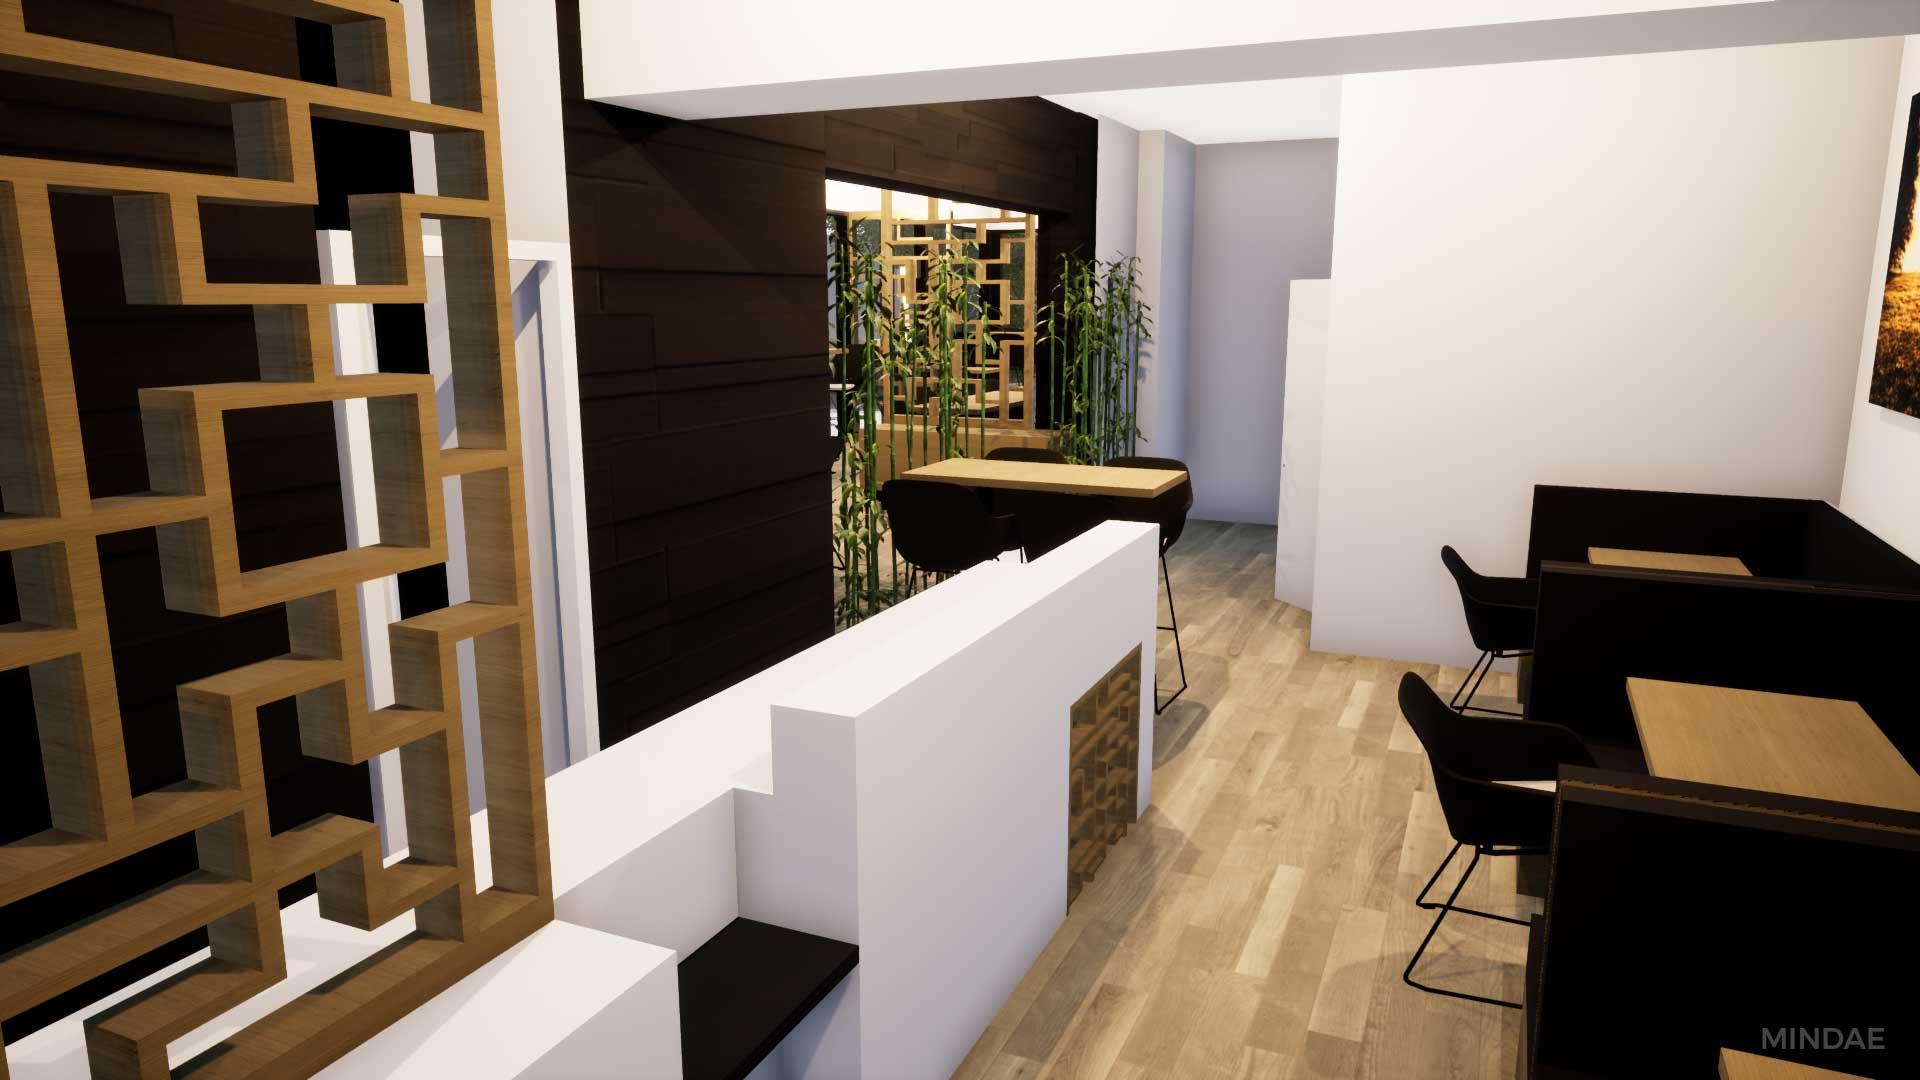 Mindae_3D_restaurant_caen_republique_agencement_bois_terrasse_comptoir-(1)